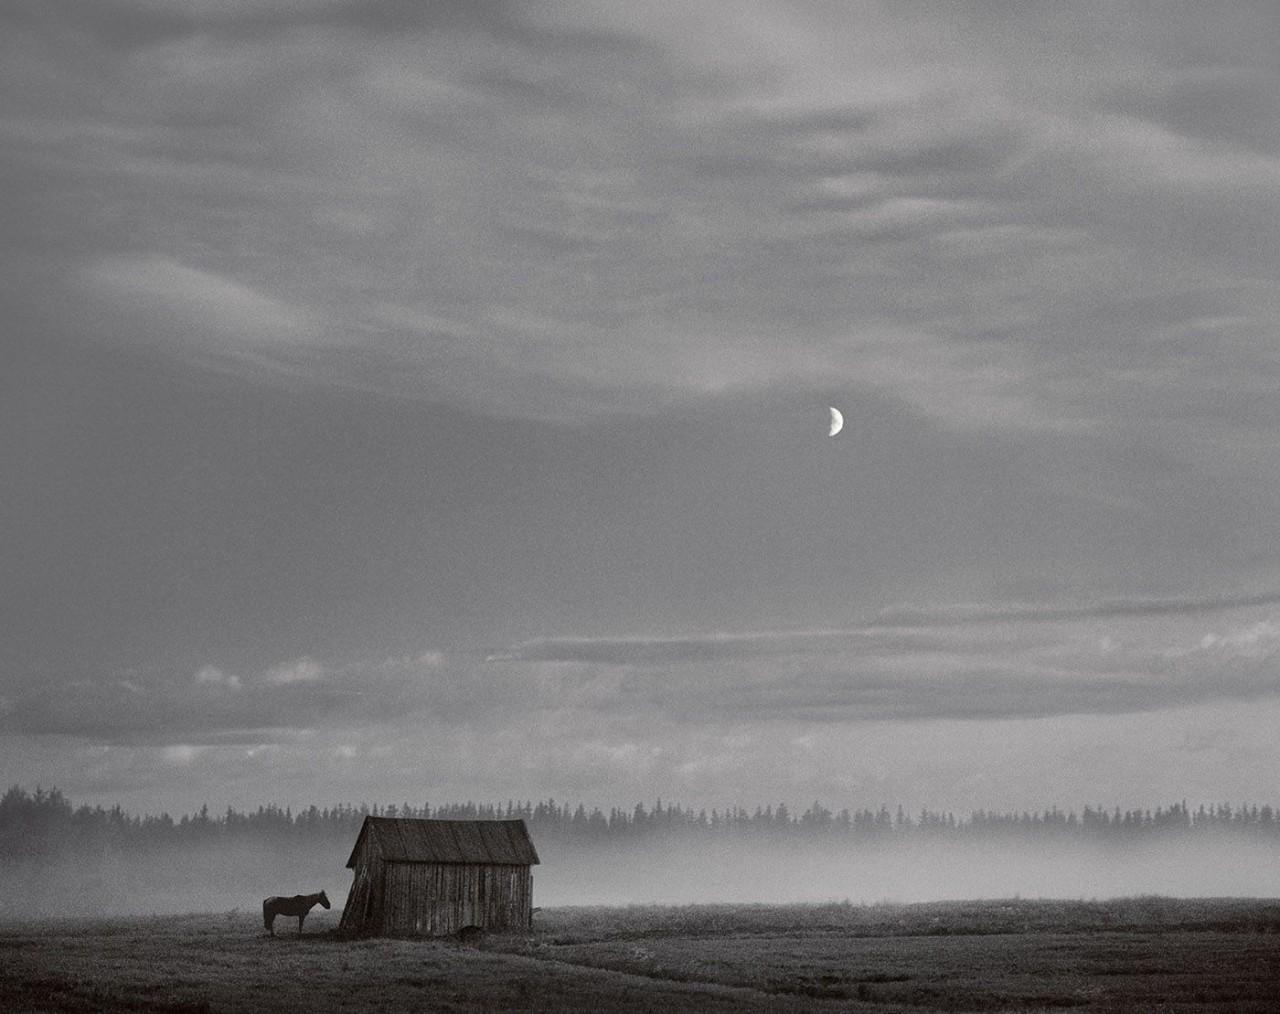 Пюхяярви, Финляндия, 1982. Фотограф Пентти Саммаллахти